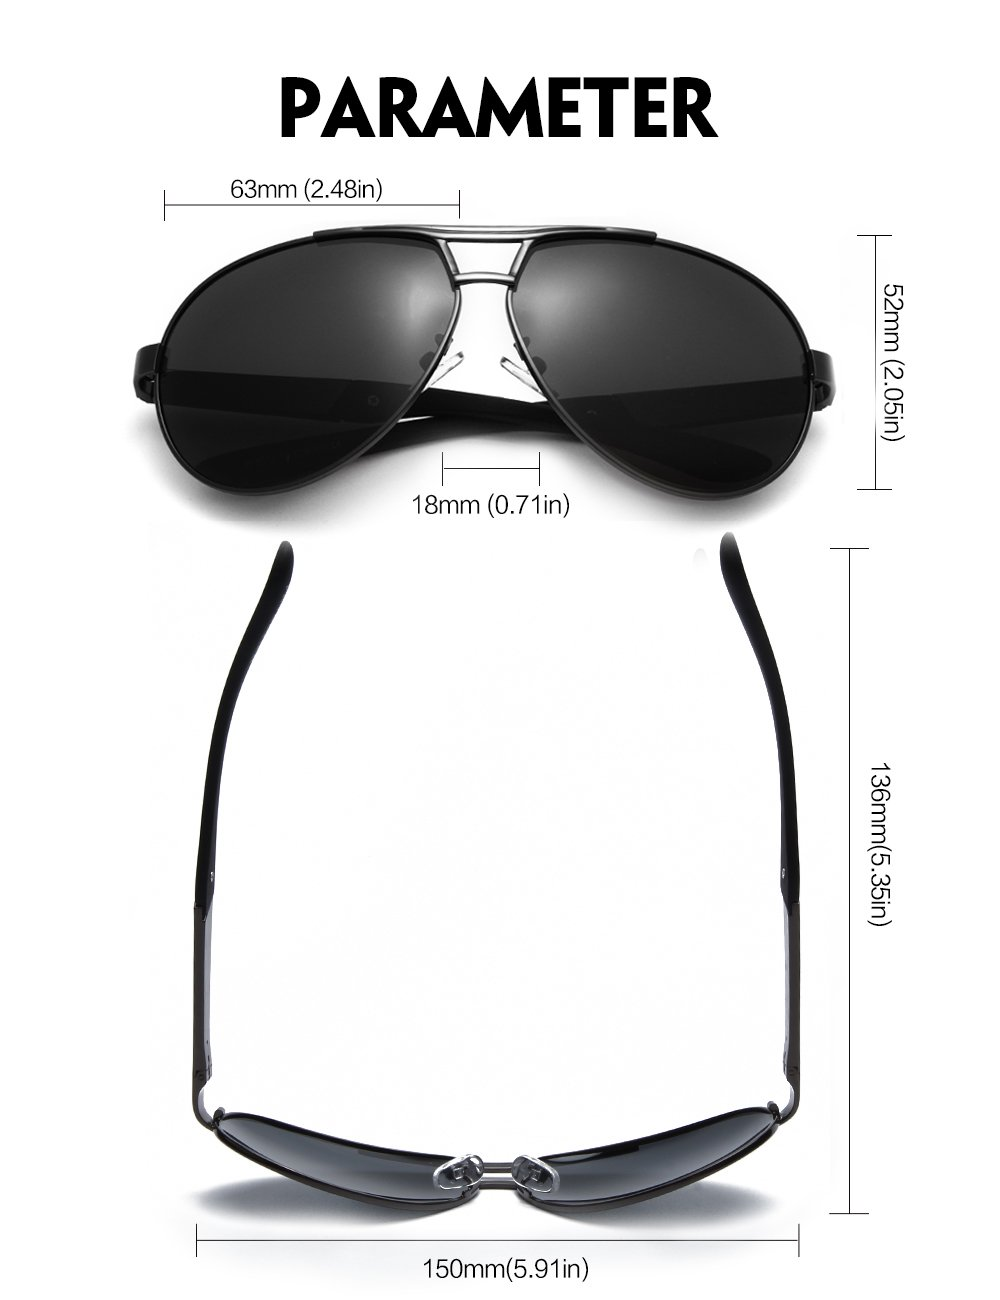 WELUK Mens Aviator Sunglasses Polarized Oversized Wide Frame Big for Men Driving Grey